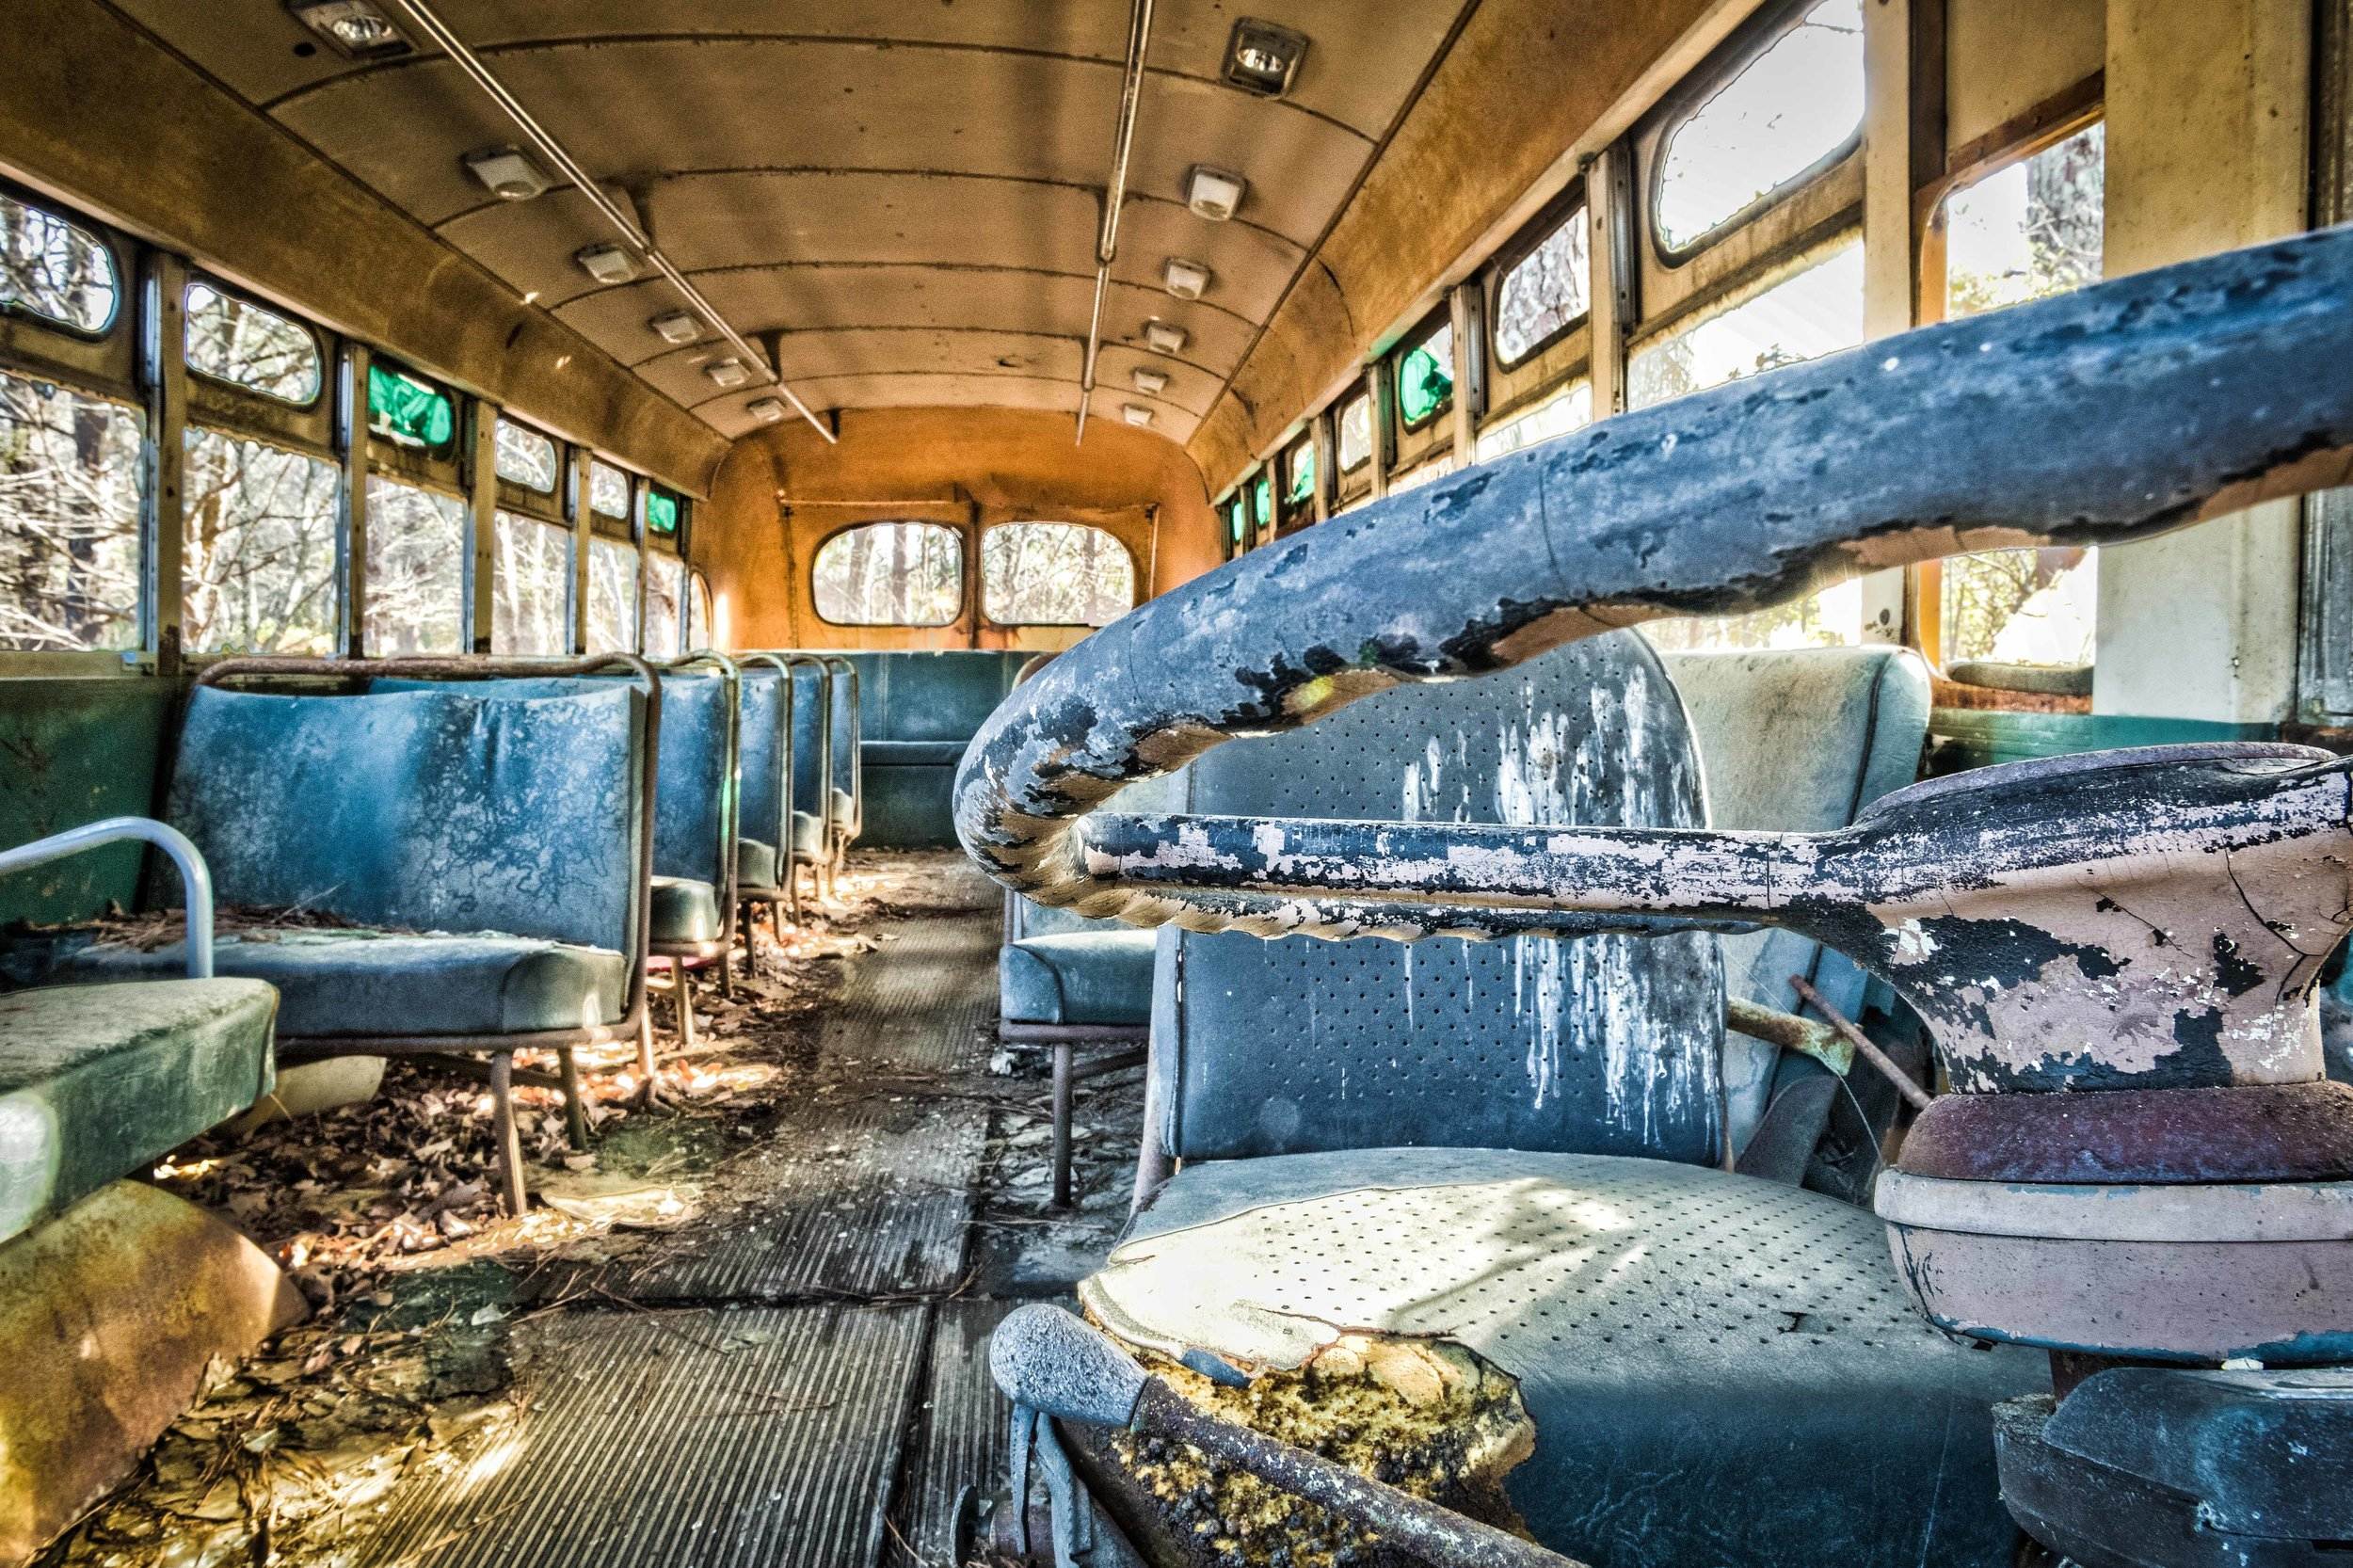 Looks like a band tour bus after a 40 city tour. I should know.